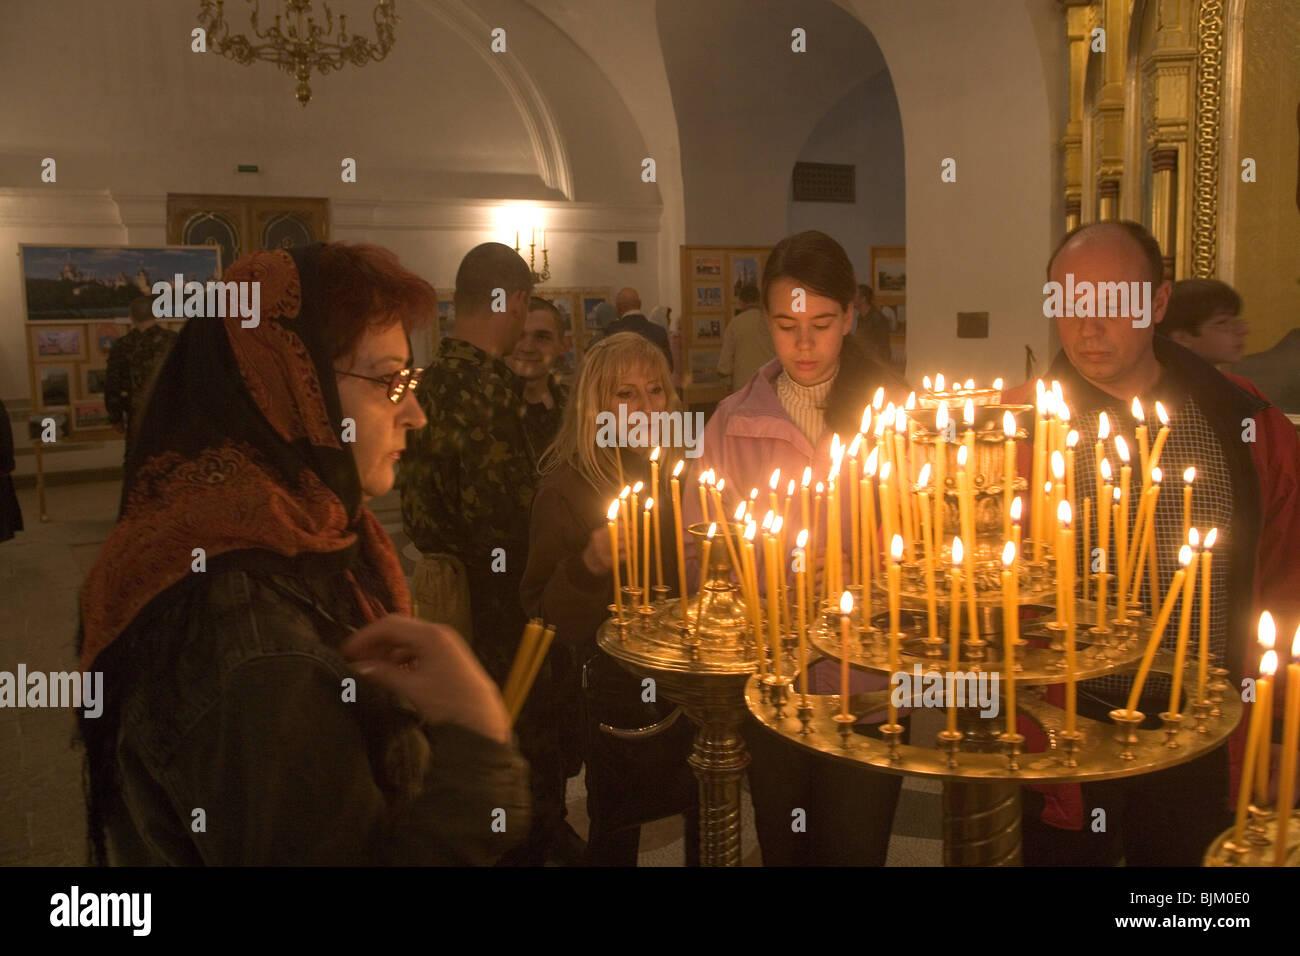 Ukraine,Crimea,Sevastopol,Chersonese Area,St. Vladimir cathedral,1861-1892,interior,Easter Holiday - Stock Image